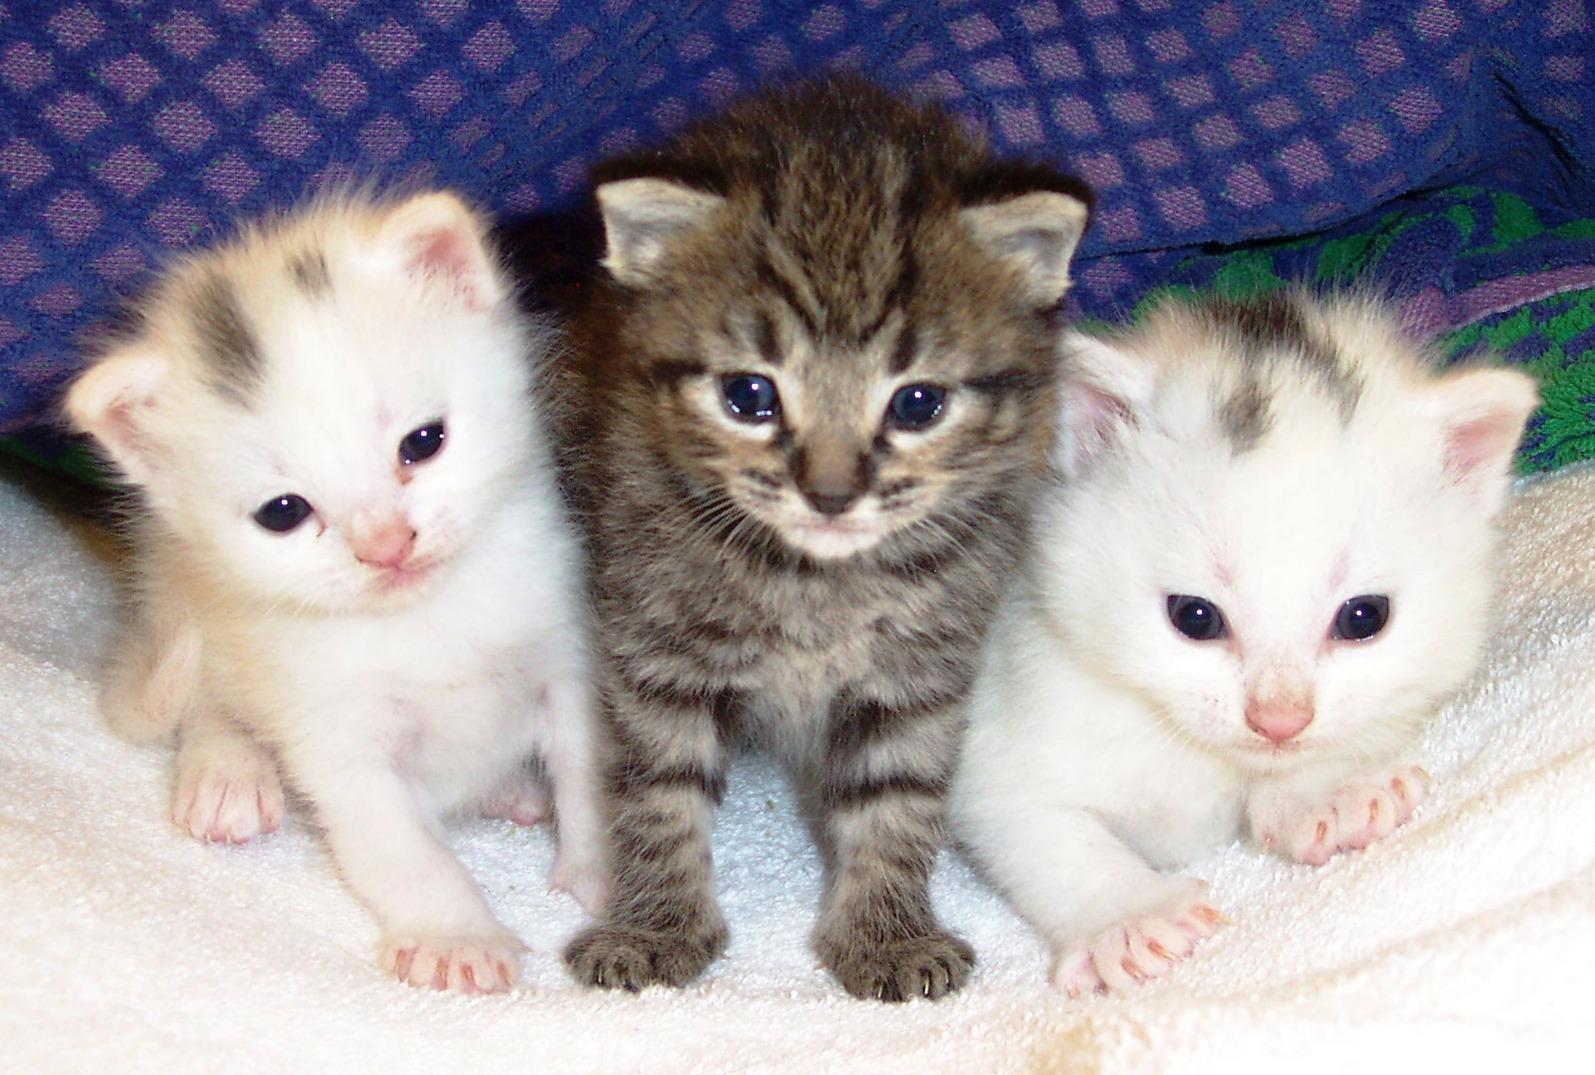 Gambar Kucing Animasi godean.web.id